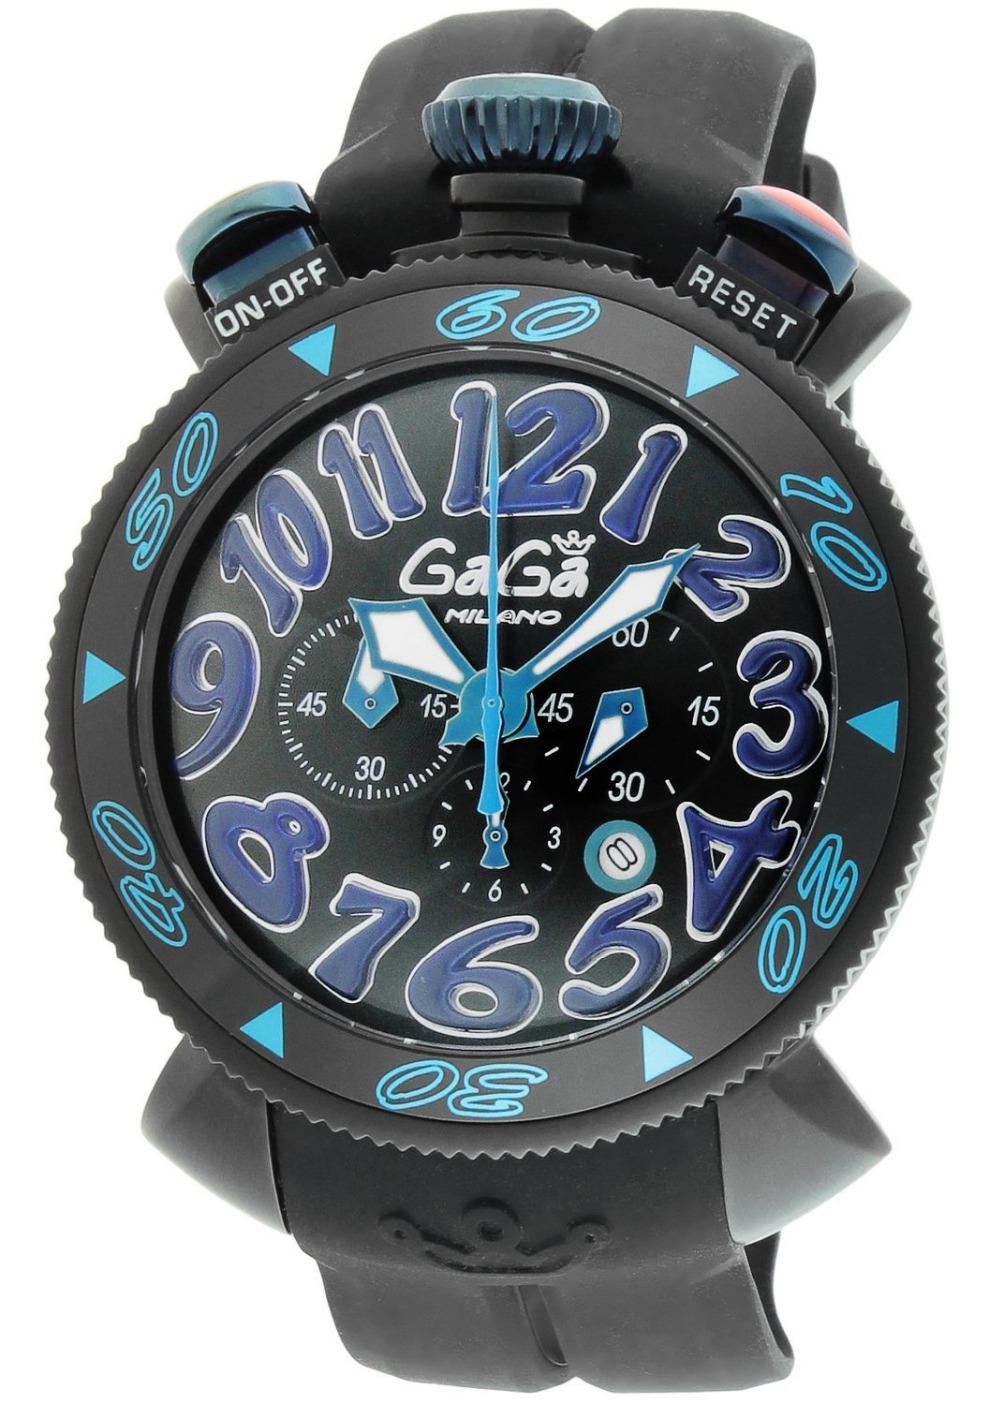 2015 NEW High Quality GAGA Chrono 48mm Blue Men Sport watch Running Cycling Gaga milano Luxury stopwatch gifts Japan 6054.1<br><br>Aliexpress